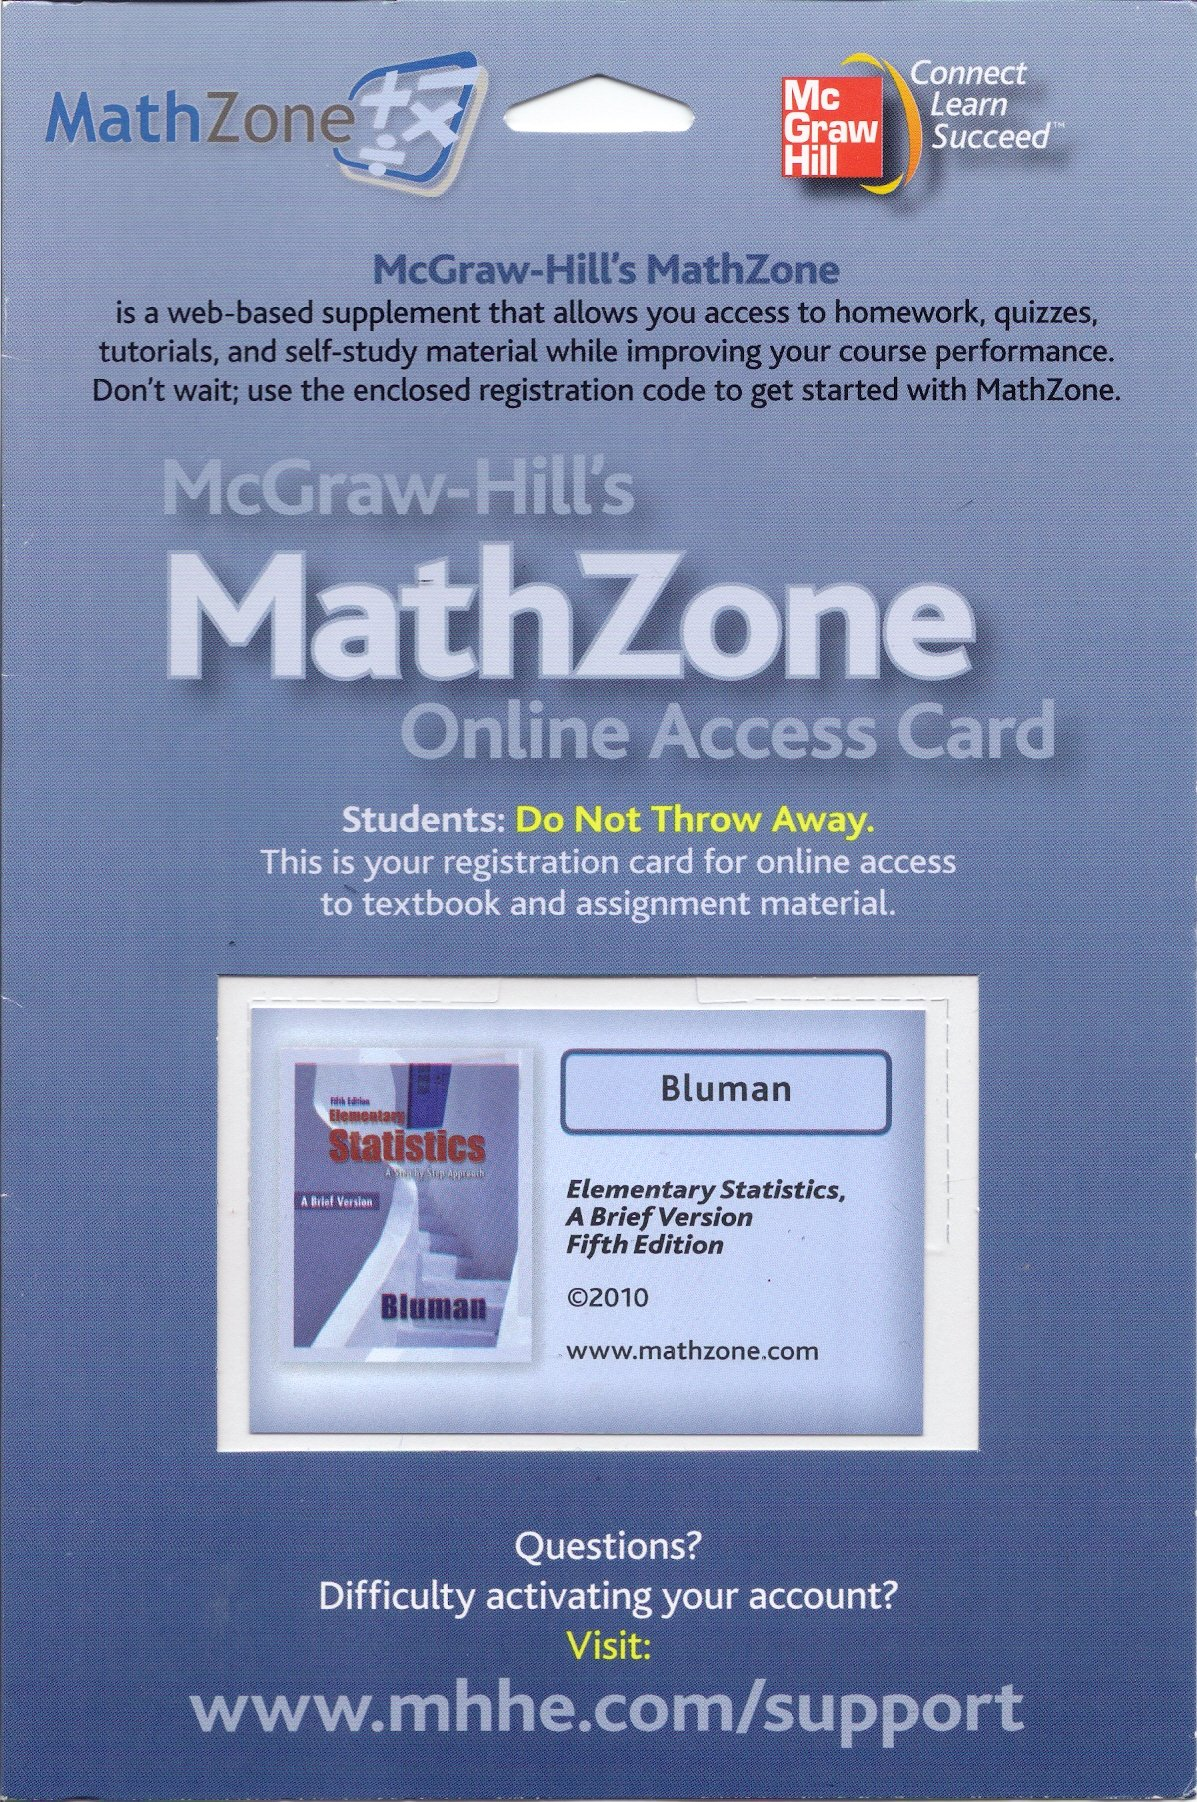 Read Online Mcgraw-Hill's MathZone Online Access Card - Bluman - Elementary Statistics, a Brief Version, Fifth Edition, 2010 (2010) pdf